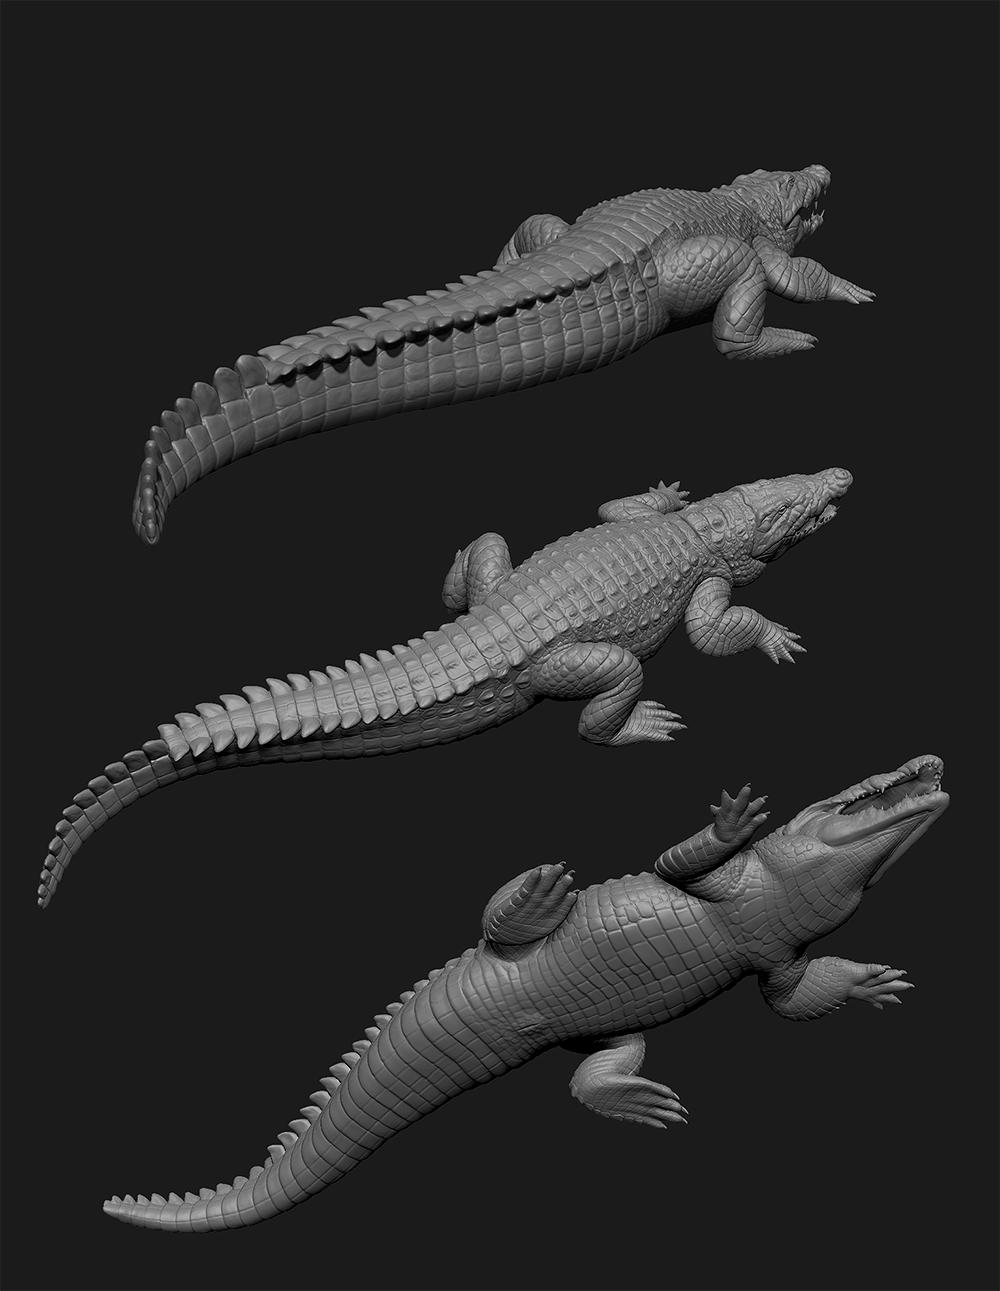 Nile Crocodile study 2 by SinKunArts on DeviantArt